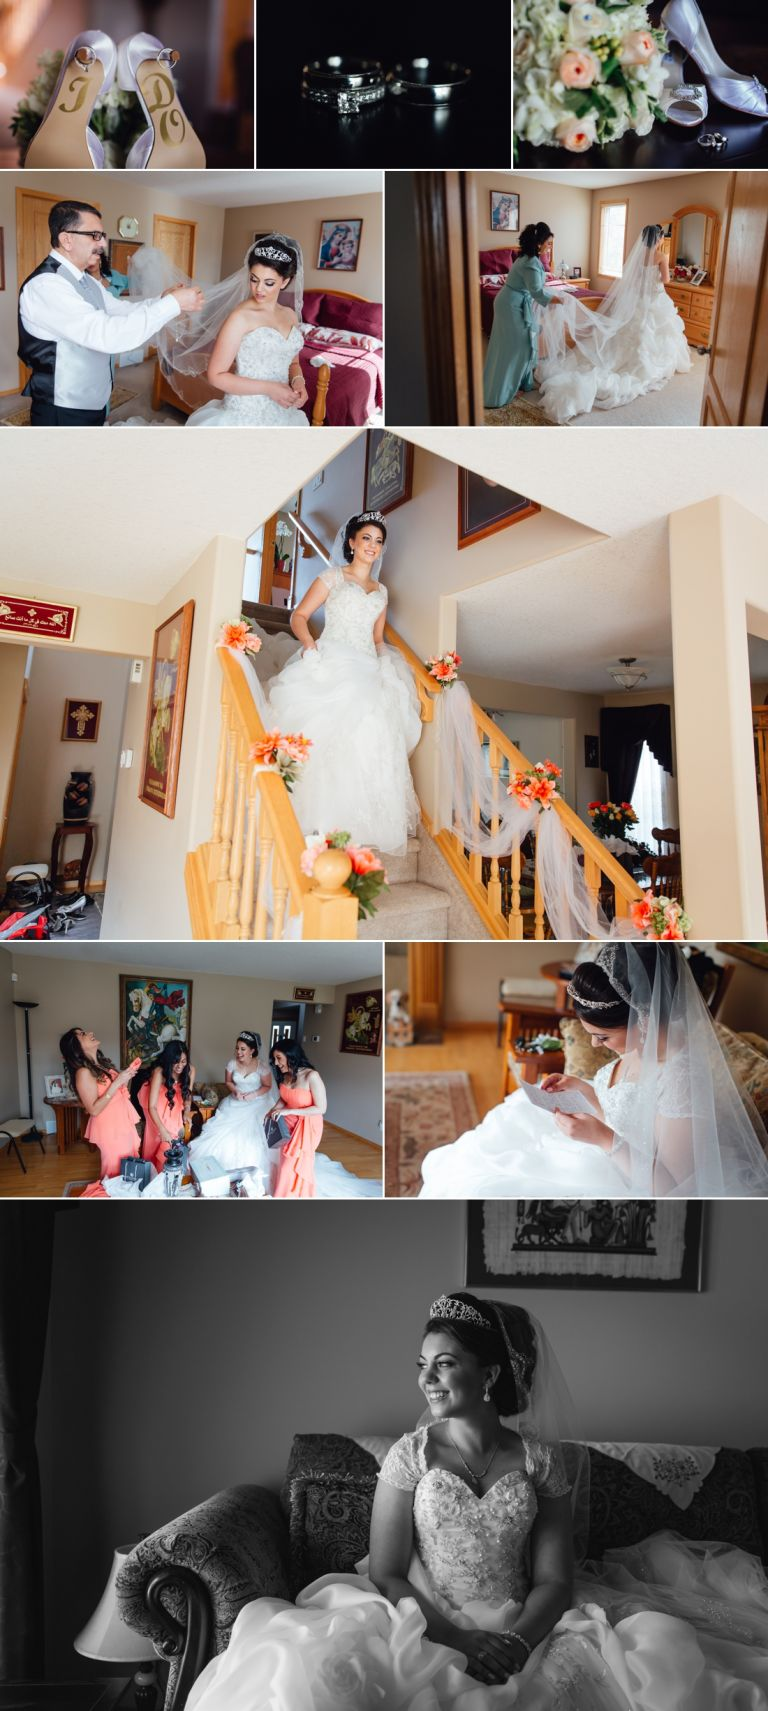 Edmonton-Wedding-Photographers-Marina-Michael-Sneak-Peek 2